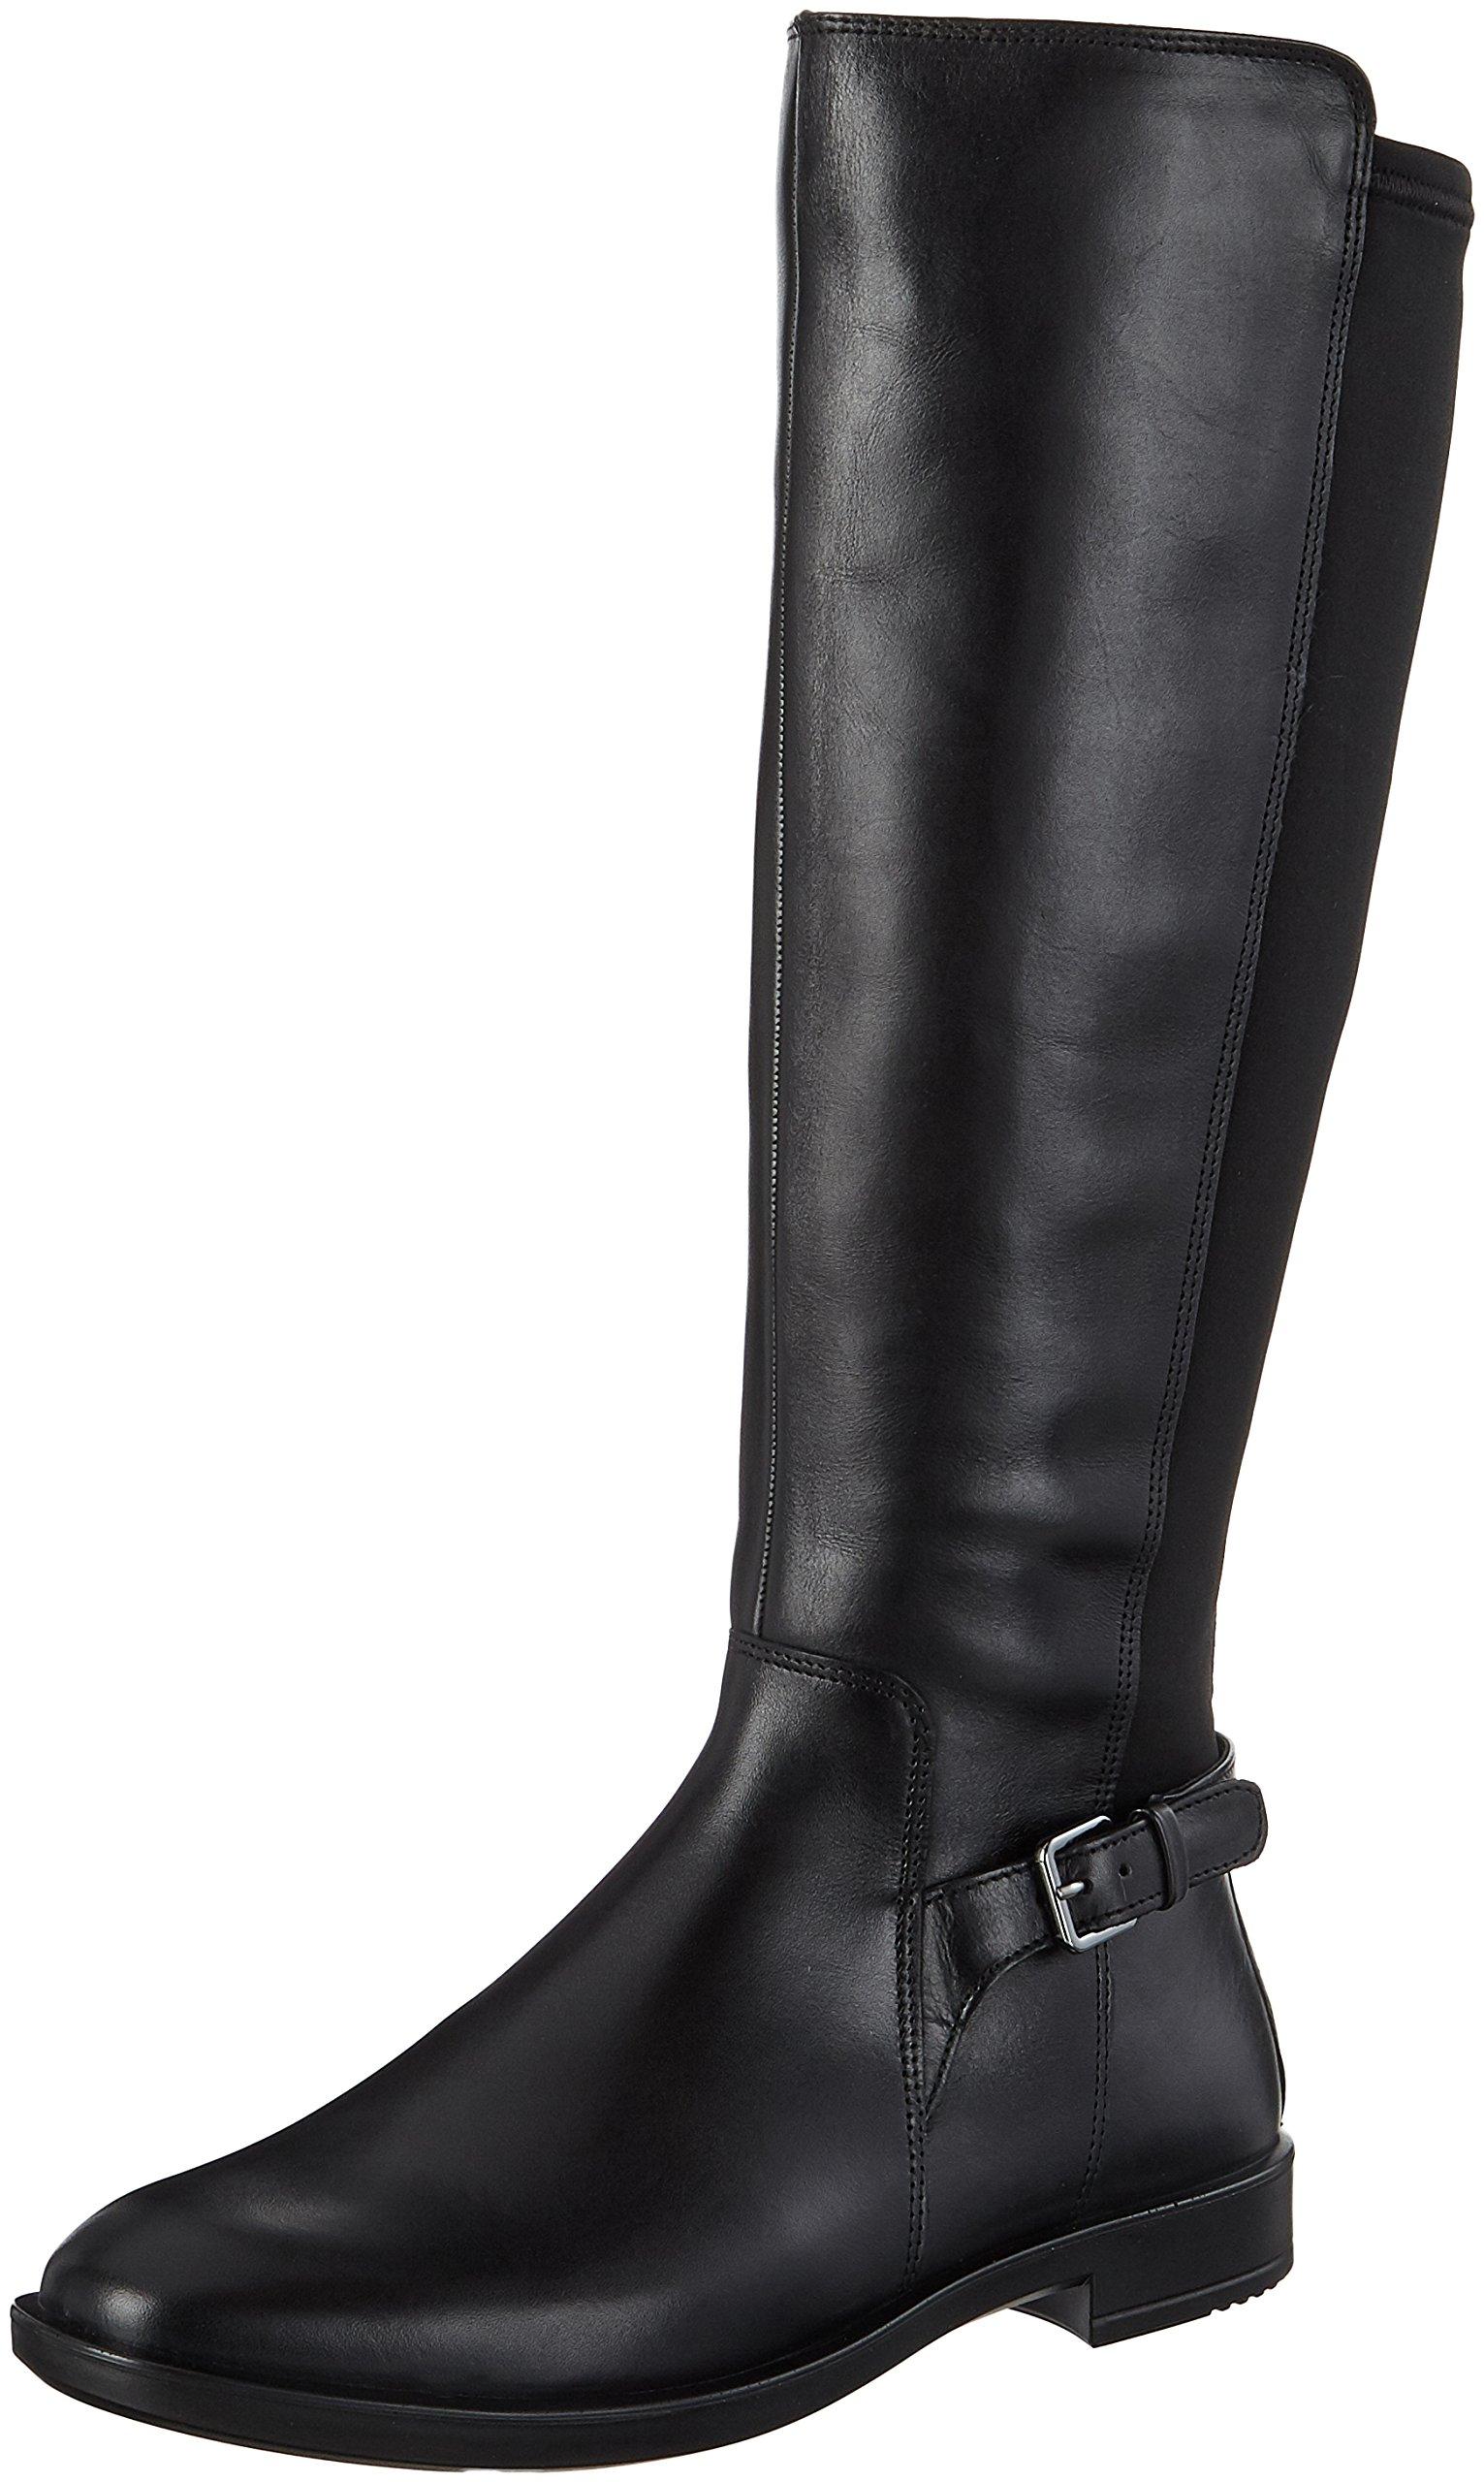 ECCO Women's Women's Shape M 15 Tall Riding Boot, Black/Black, 39 EU / 8-8.5 US